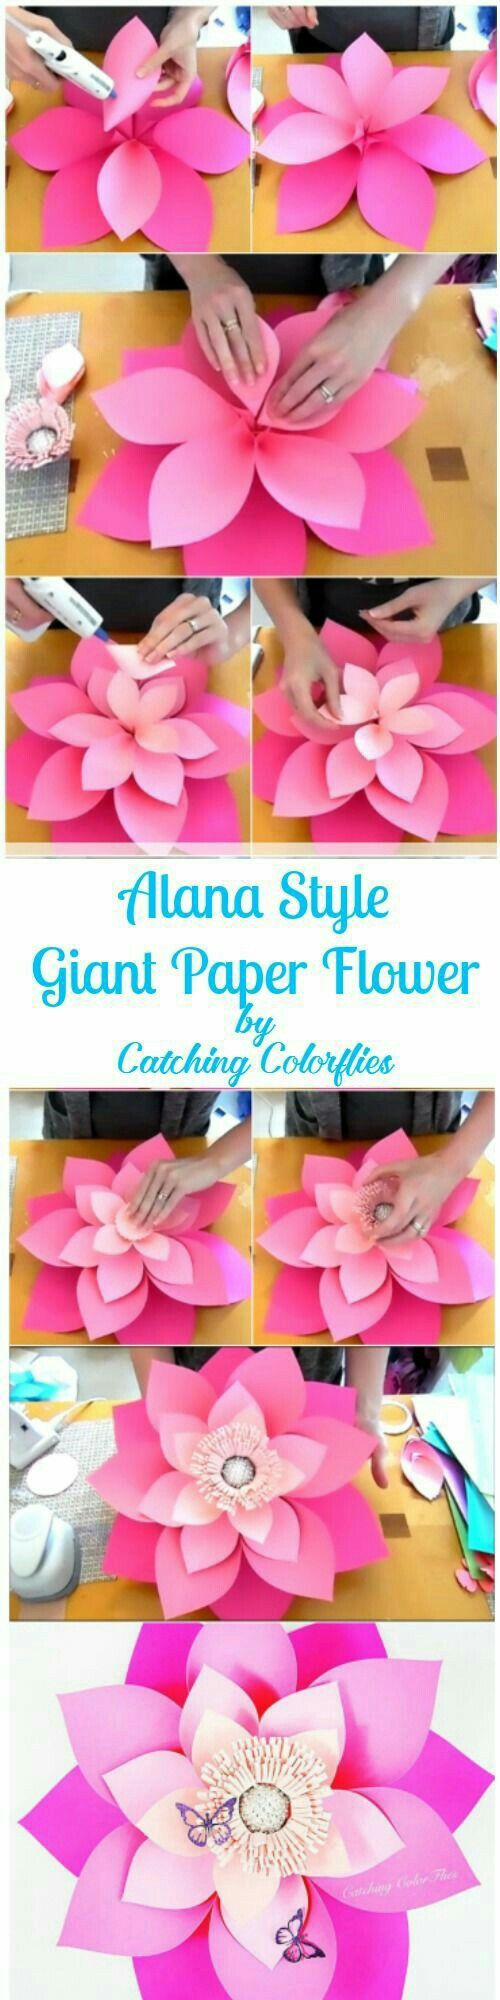 Manuacalidades Dia Das Mes Pinterest Flowers Tutorials And